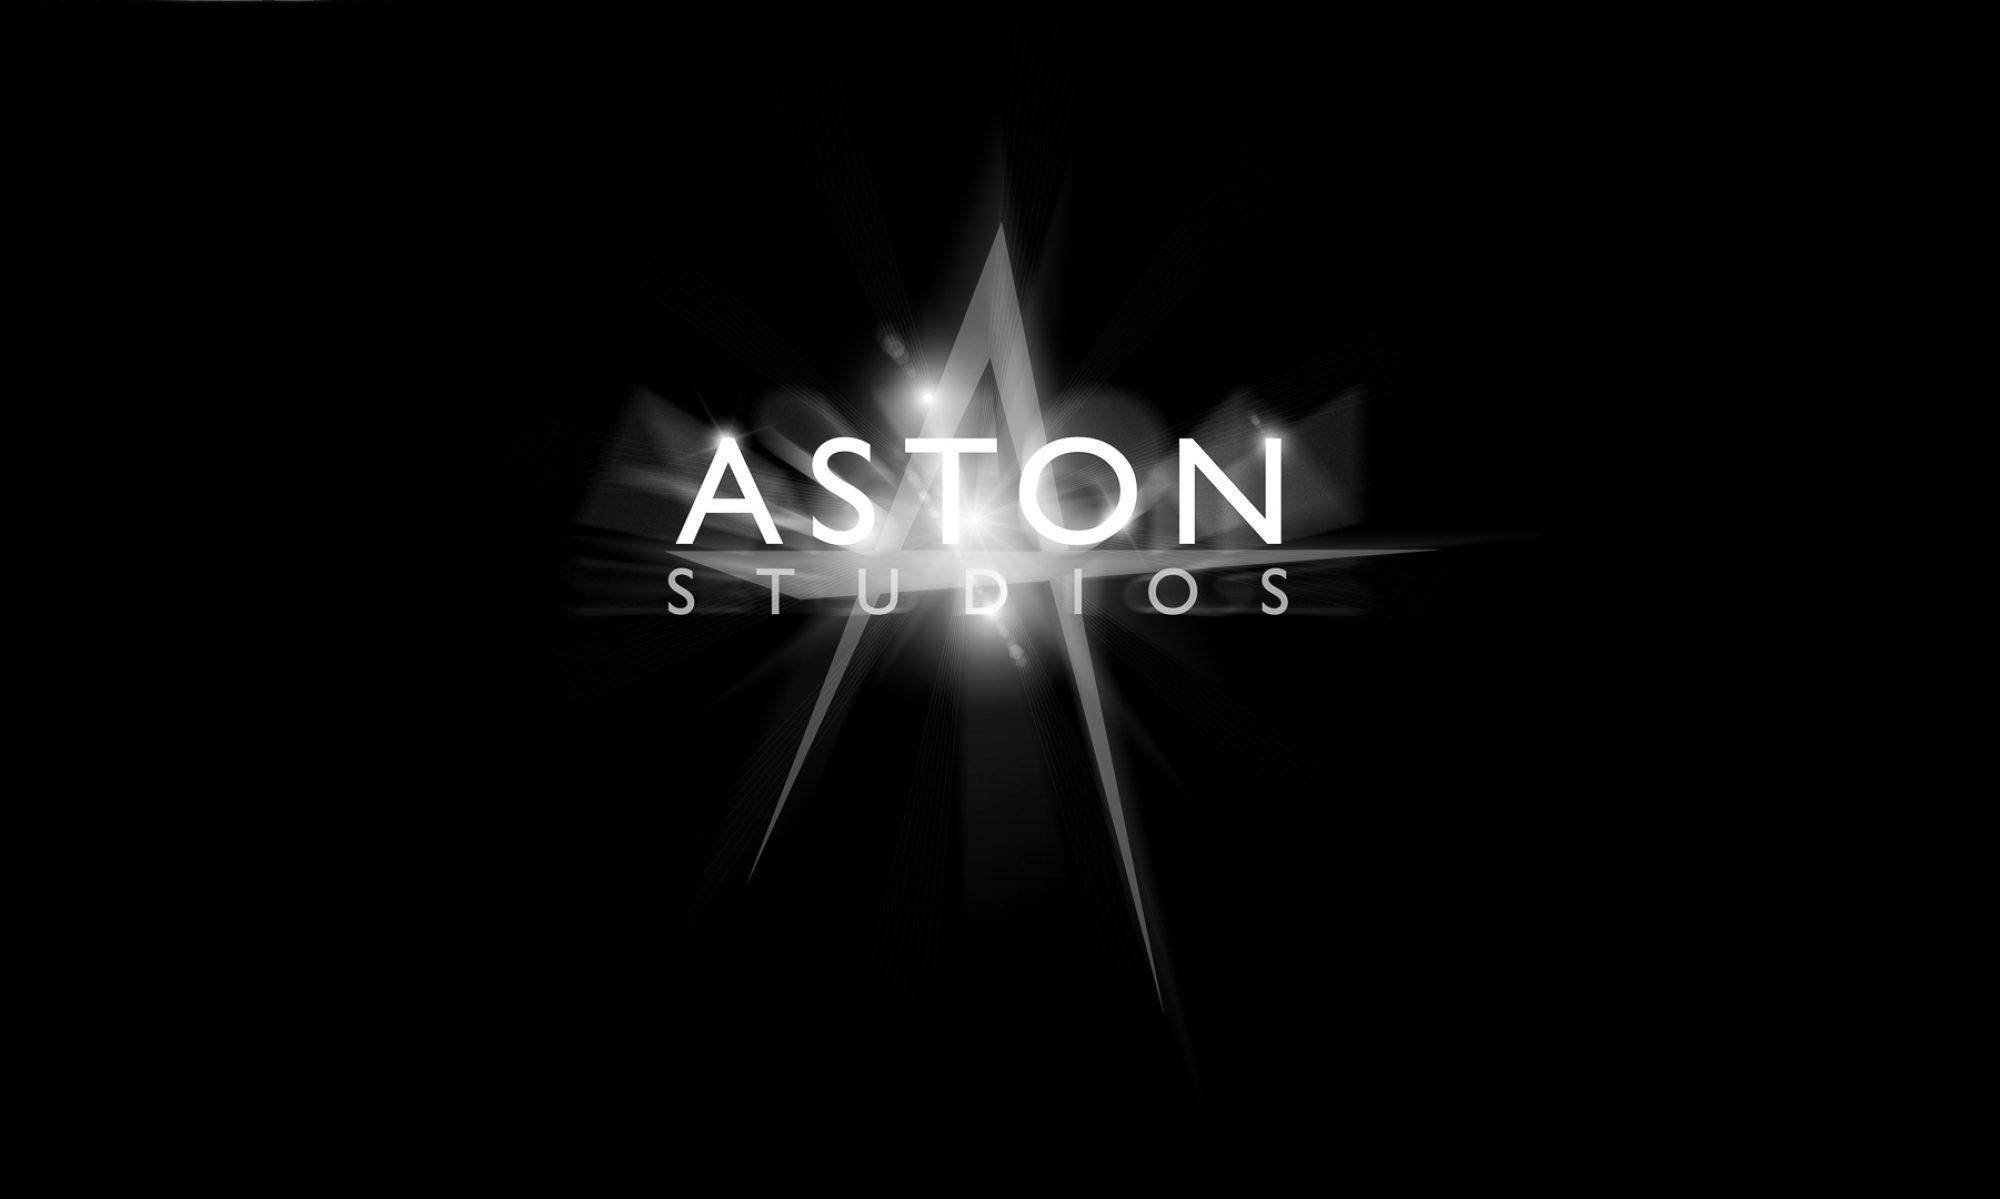 Aston Studios